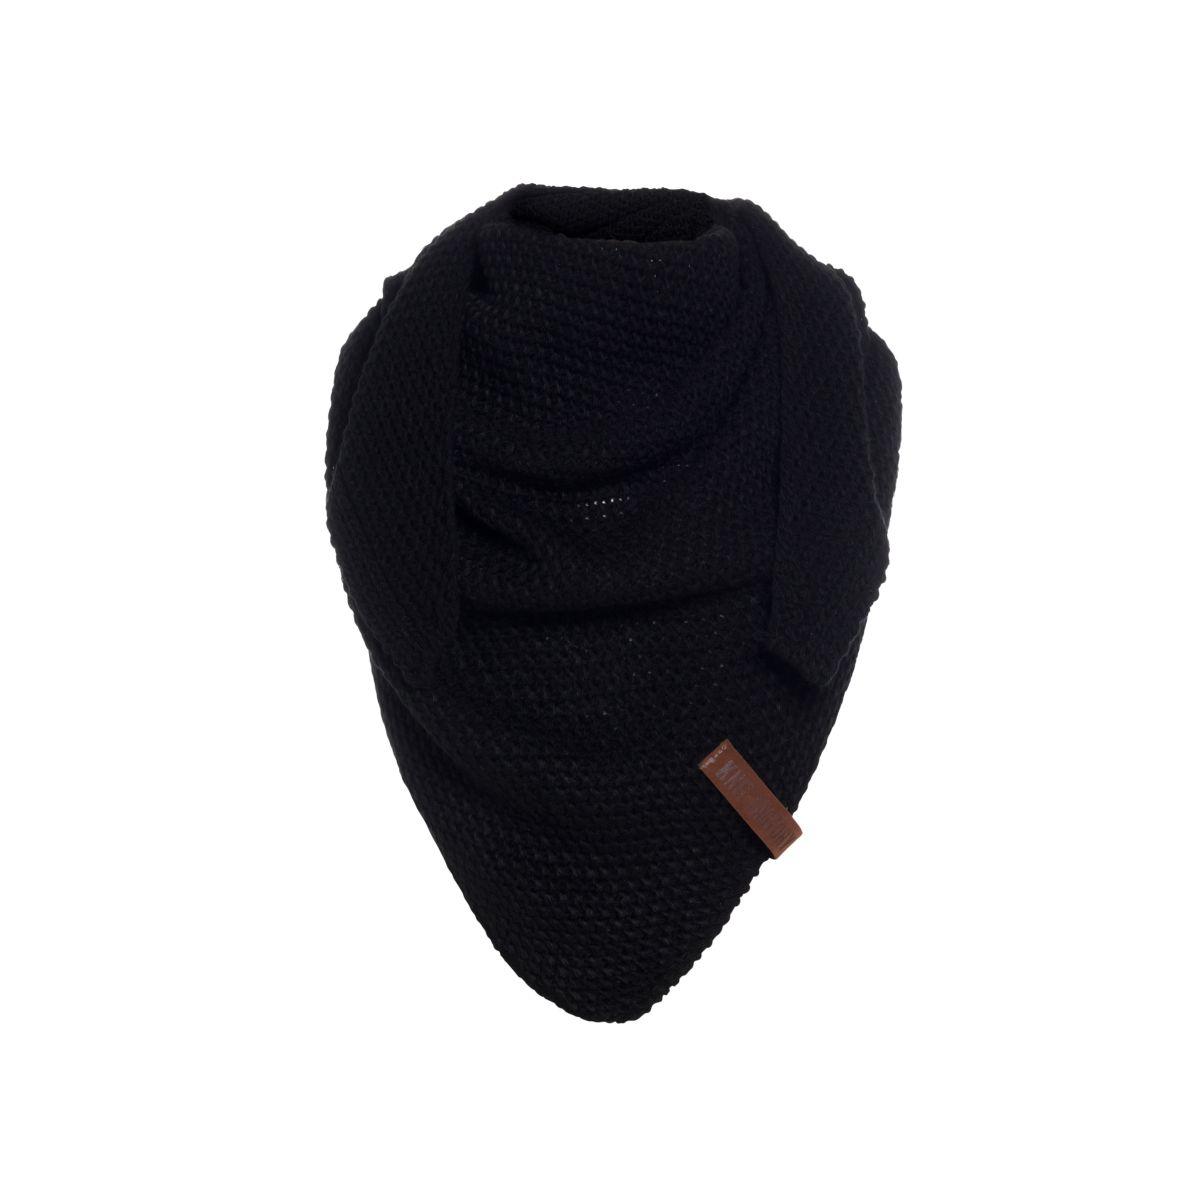 knit factory 1205900 coco omslagdoek junior zwart 1